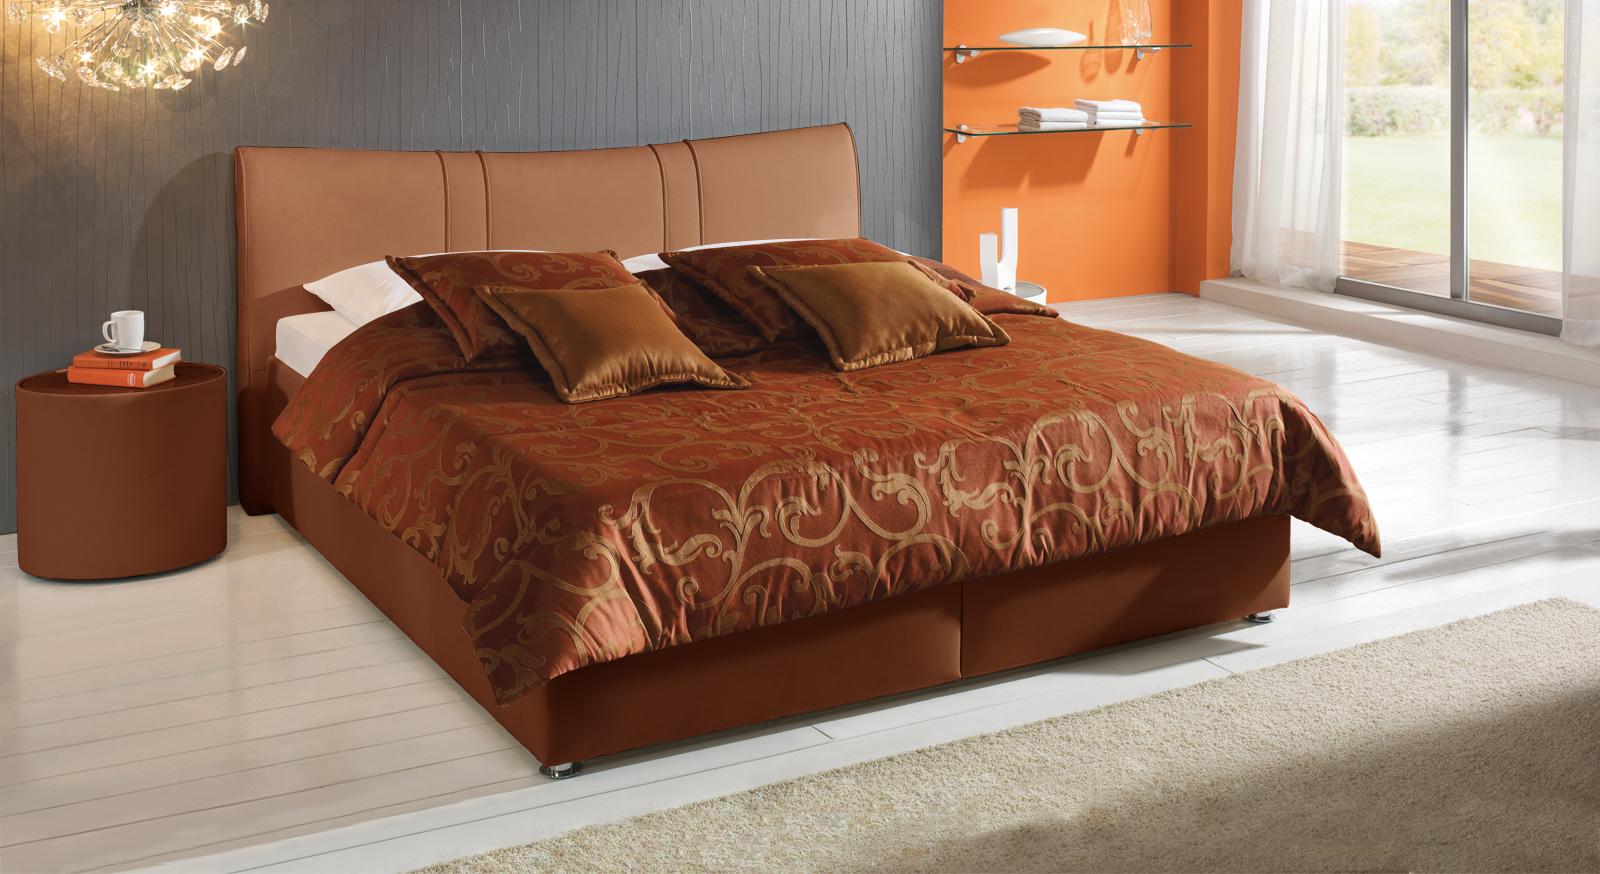 Bett Venetien terracotta kaufen